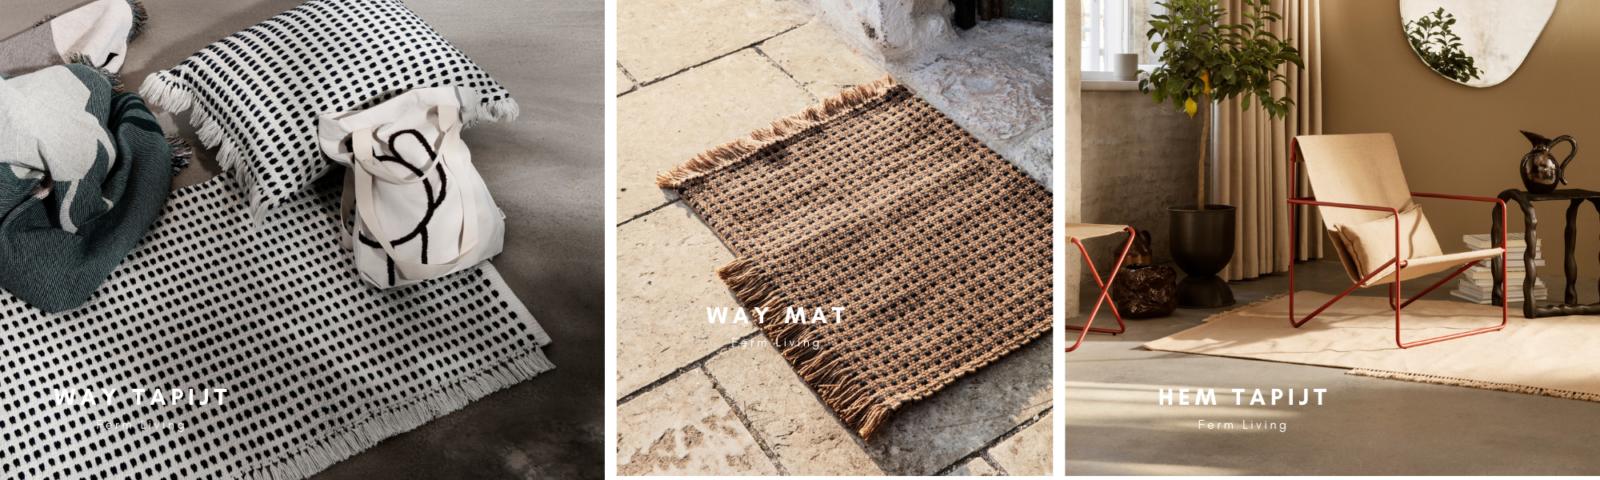 tapijt huiszwaluw home